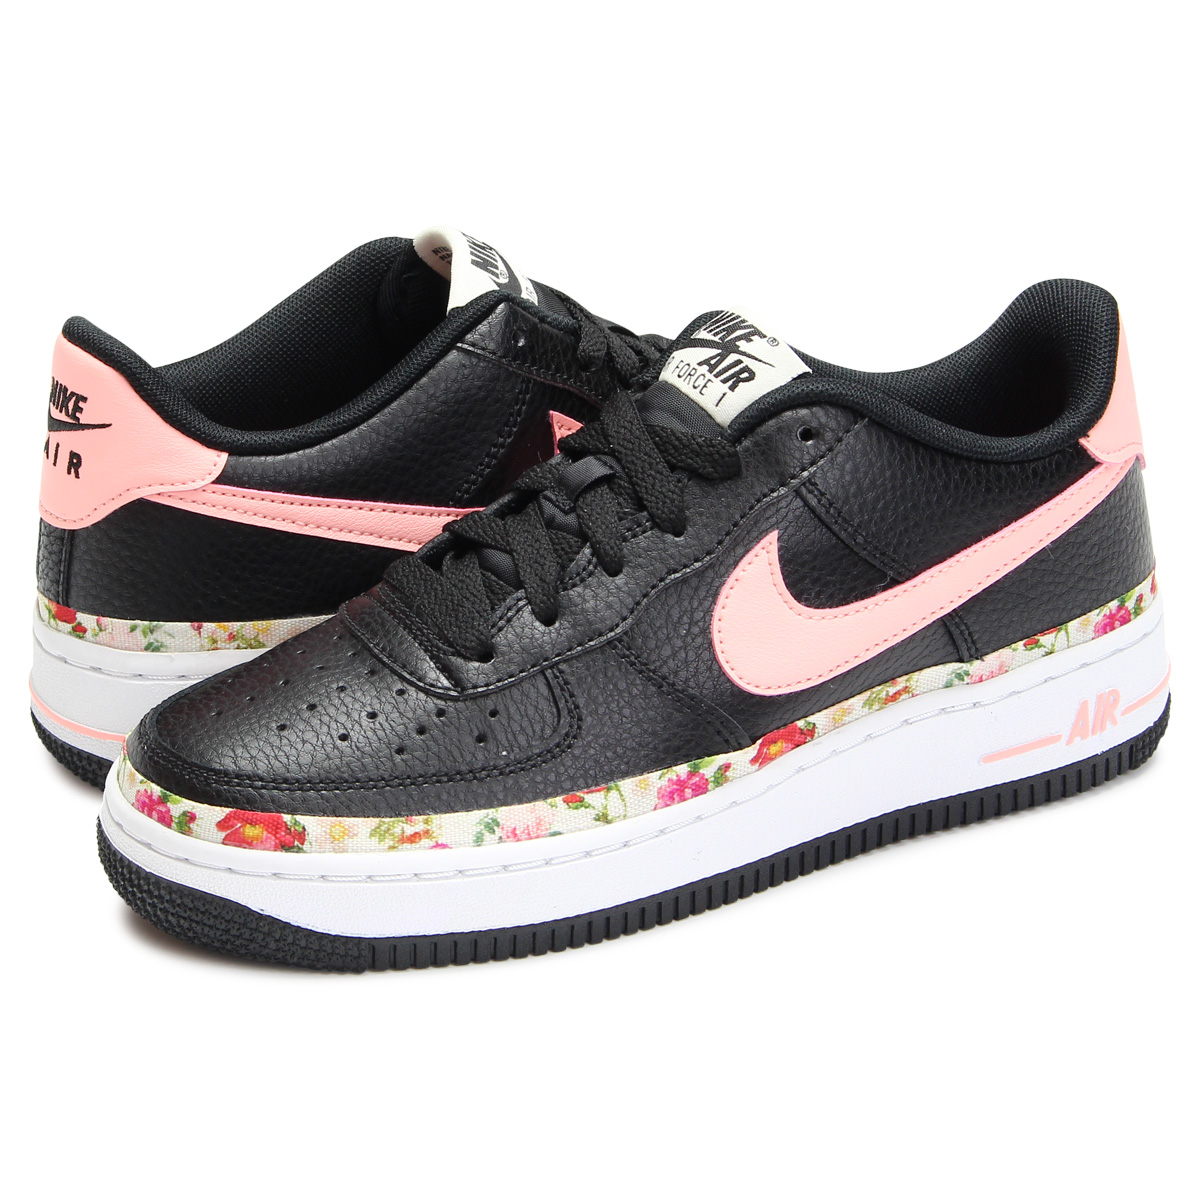 Nike NIKE air force 1 sneakers Lady's AIR FORCE 1 V.F. GS black black BQ2501 001